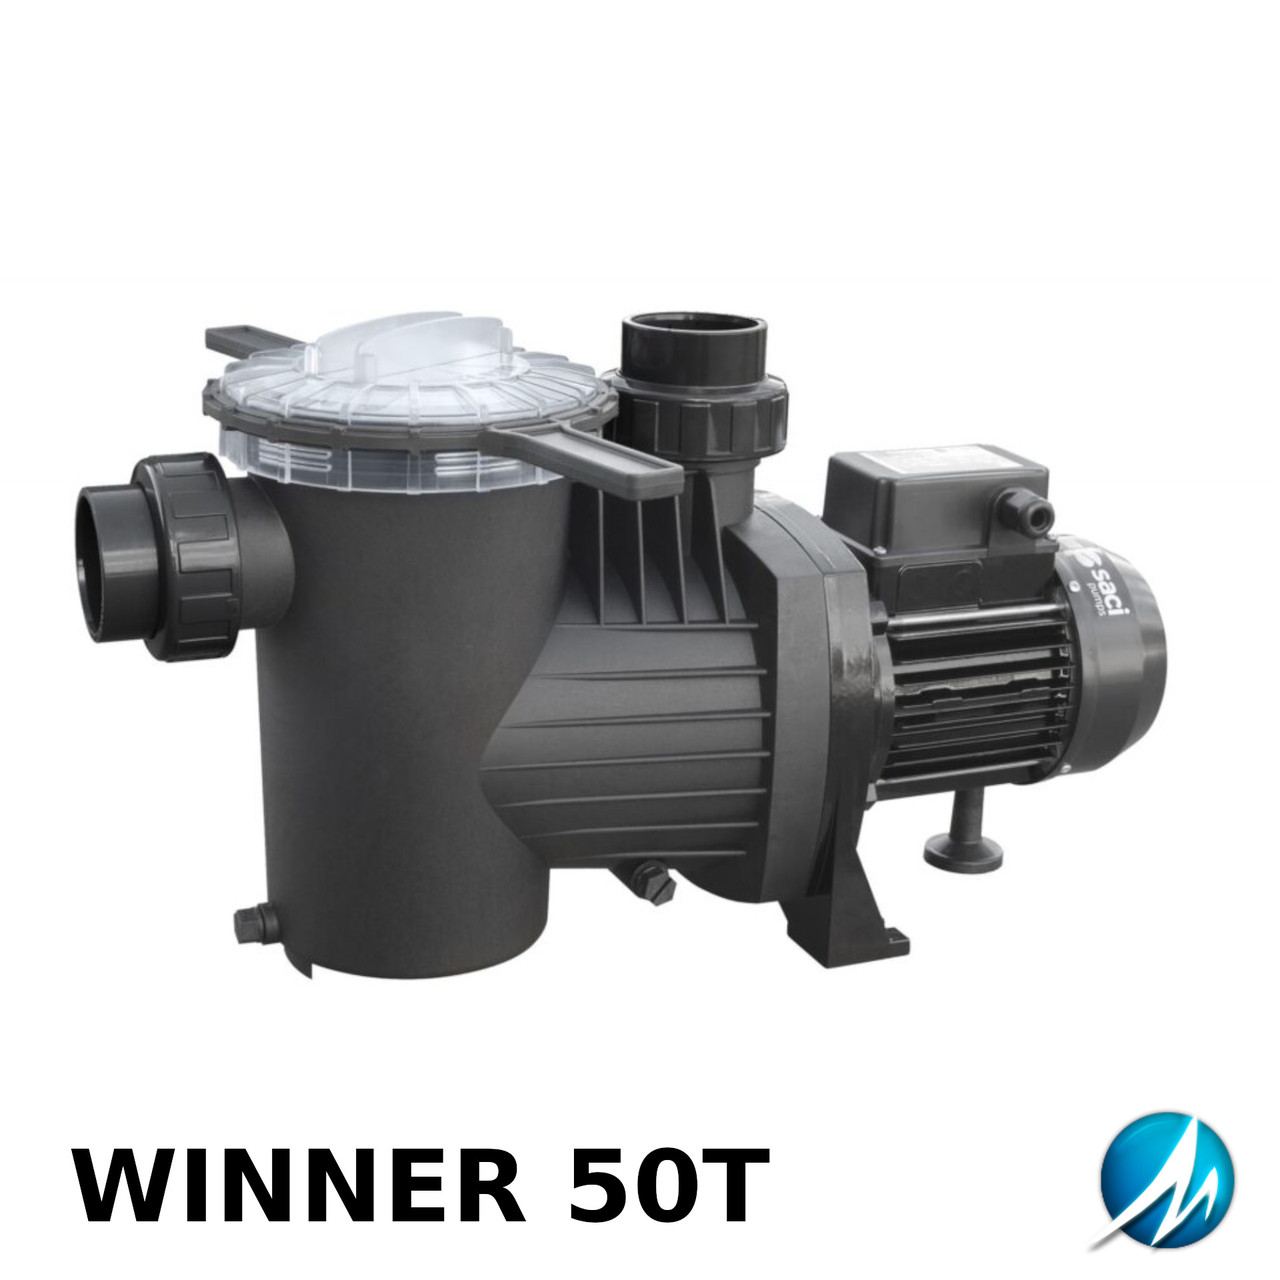 Насос Saci WINNER 50T (380В,13.5м3/год)